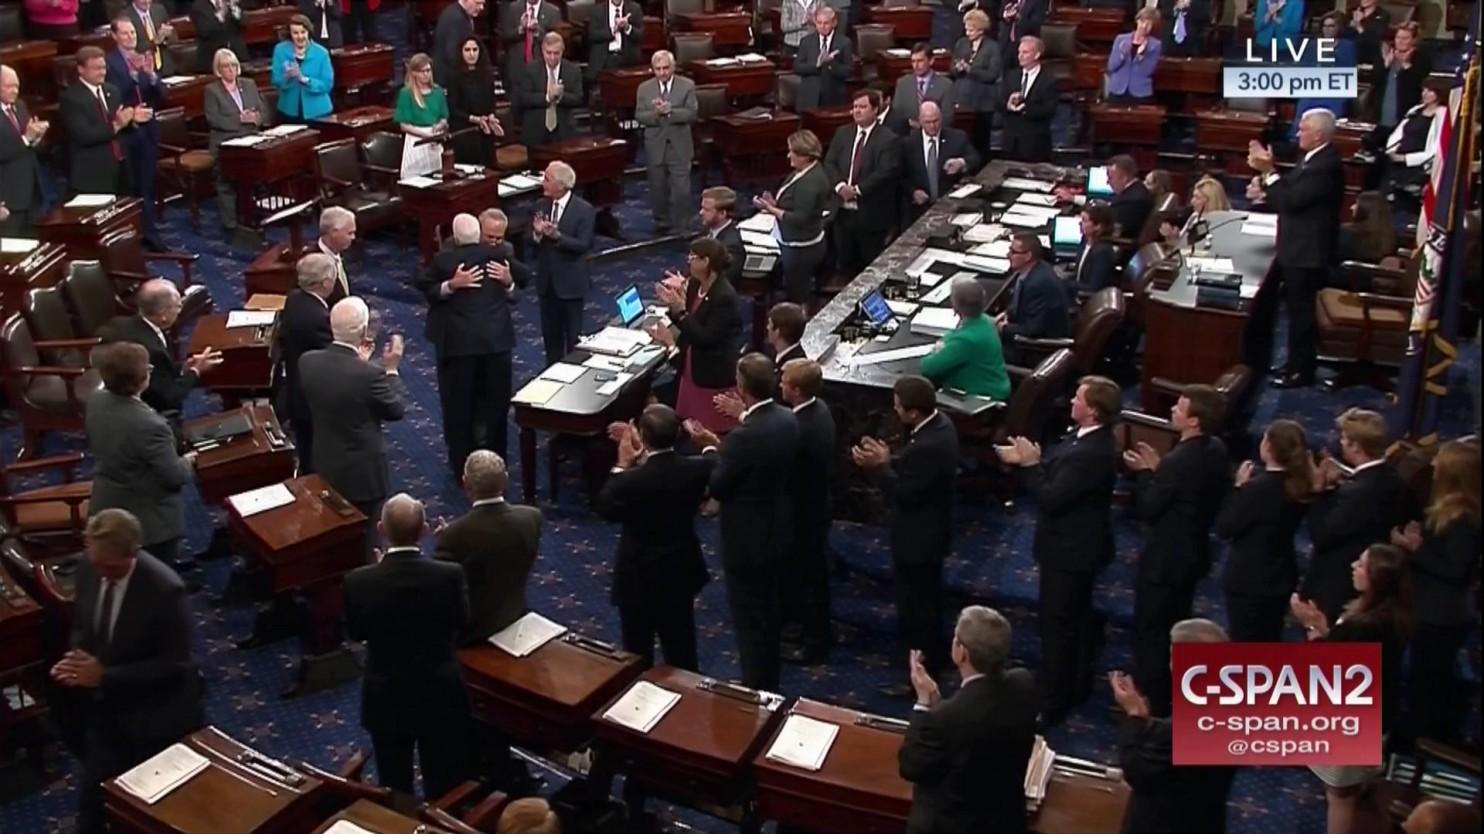 McCain_91419.jpg-2a125.jpg